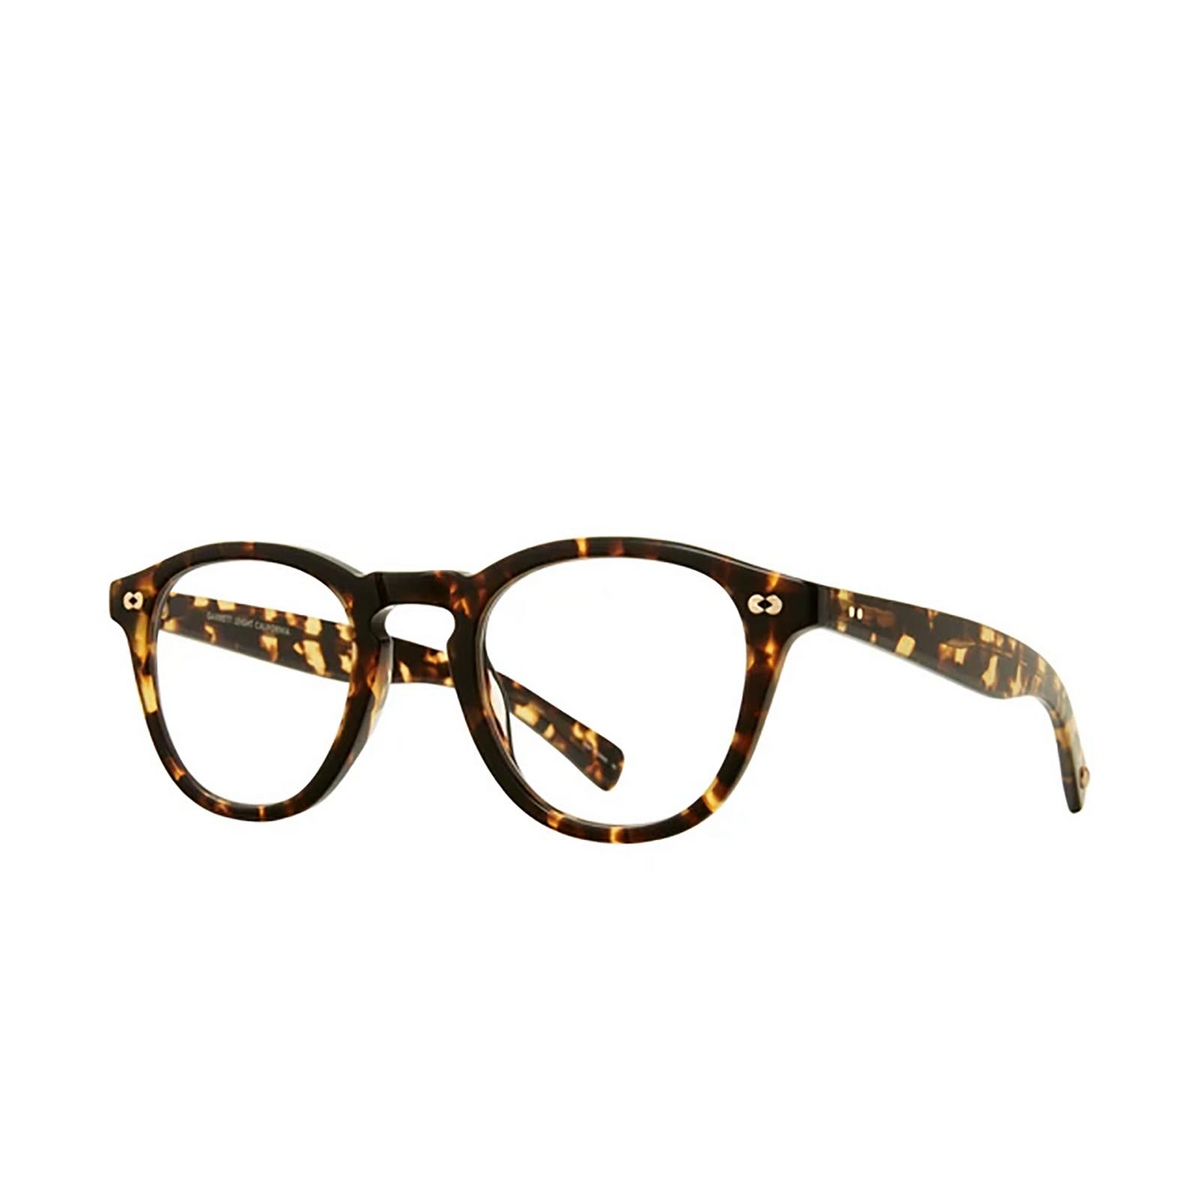 Garrett Leight® Square Eyeglasses: Hampton X color Tuscan Tortoise Tut - three-quarters view.